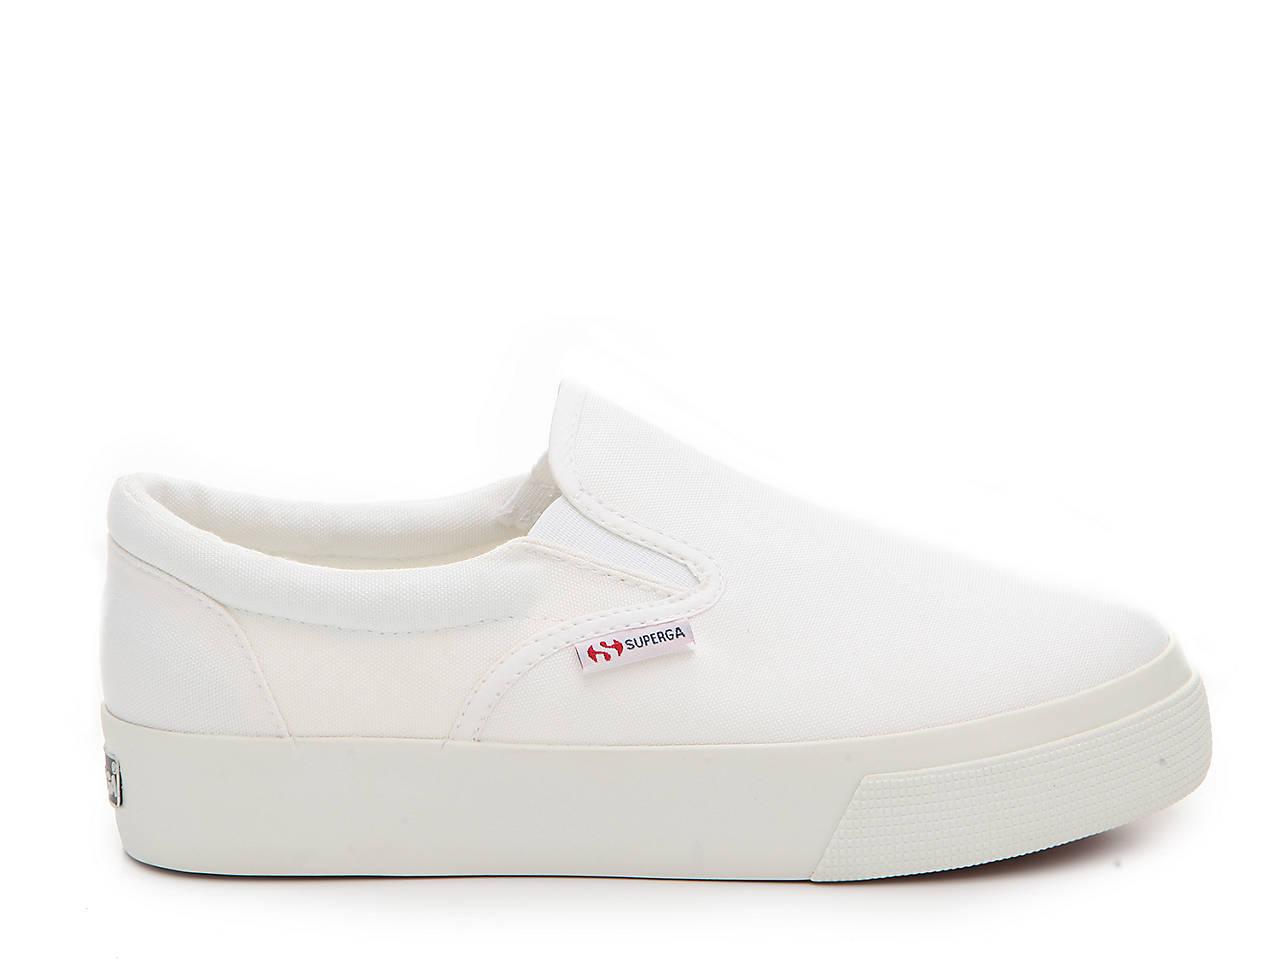 a6e318c50d8 Superga 2398 Platform Slip-On Sneaker Men s Shoes